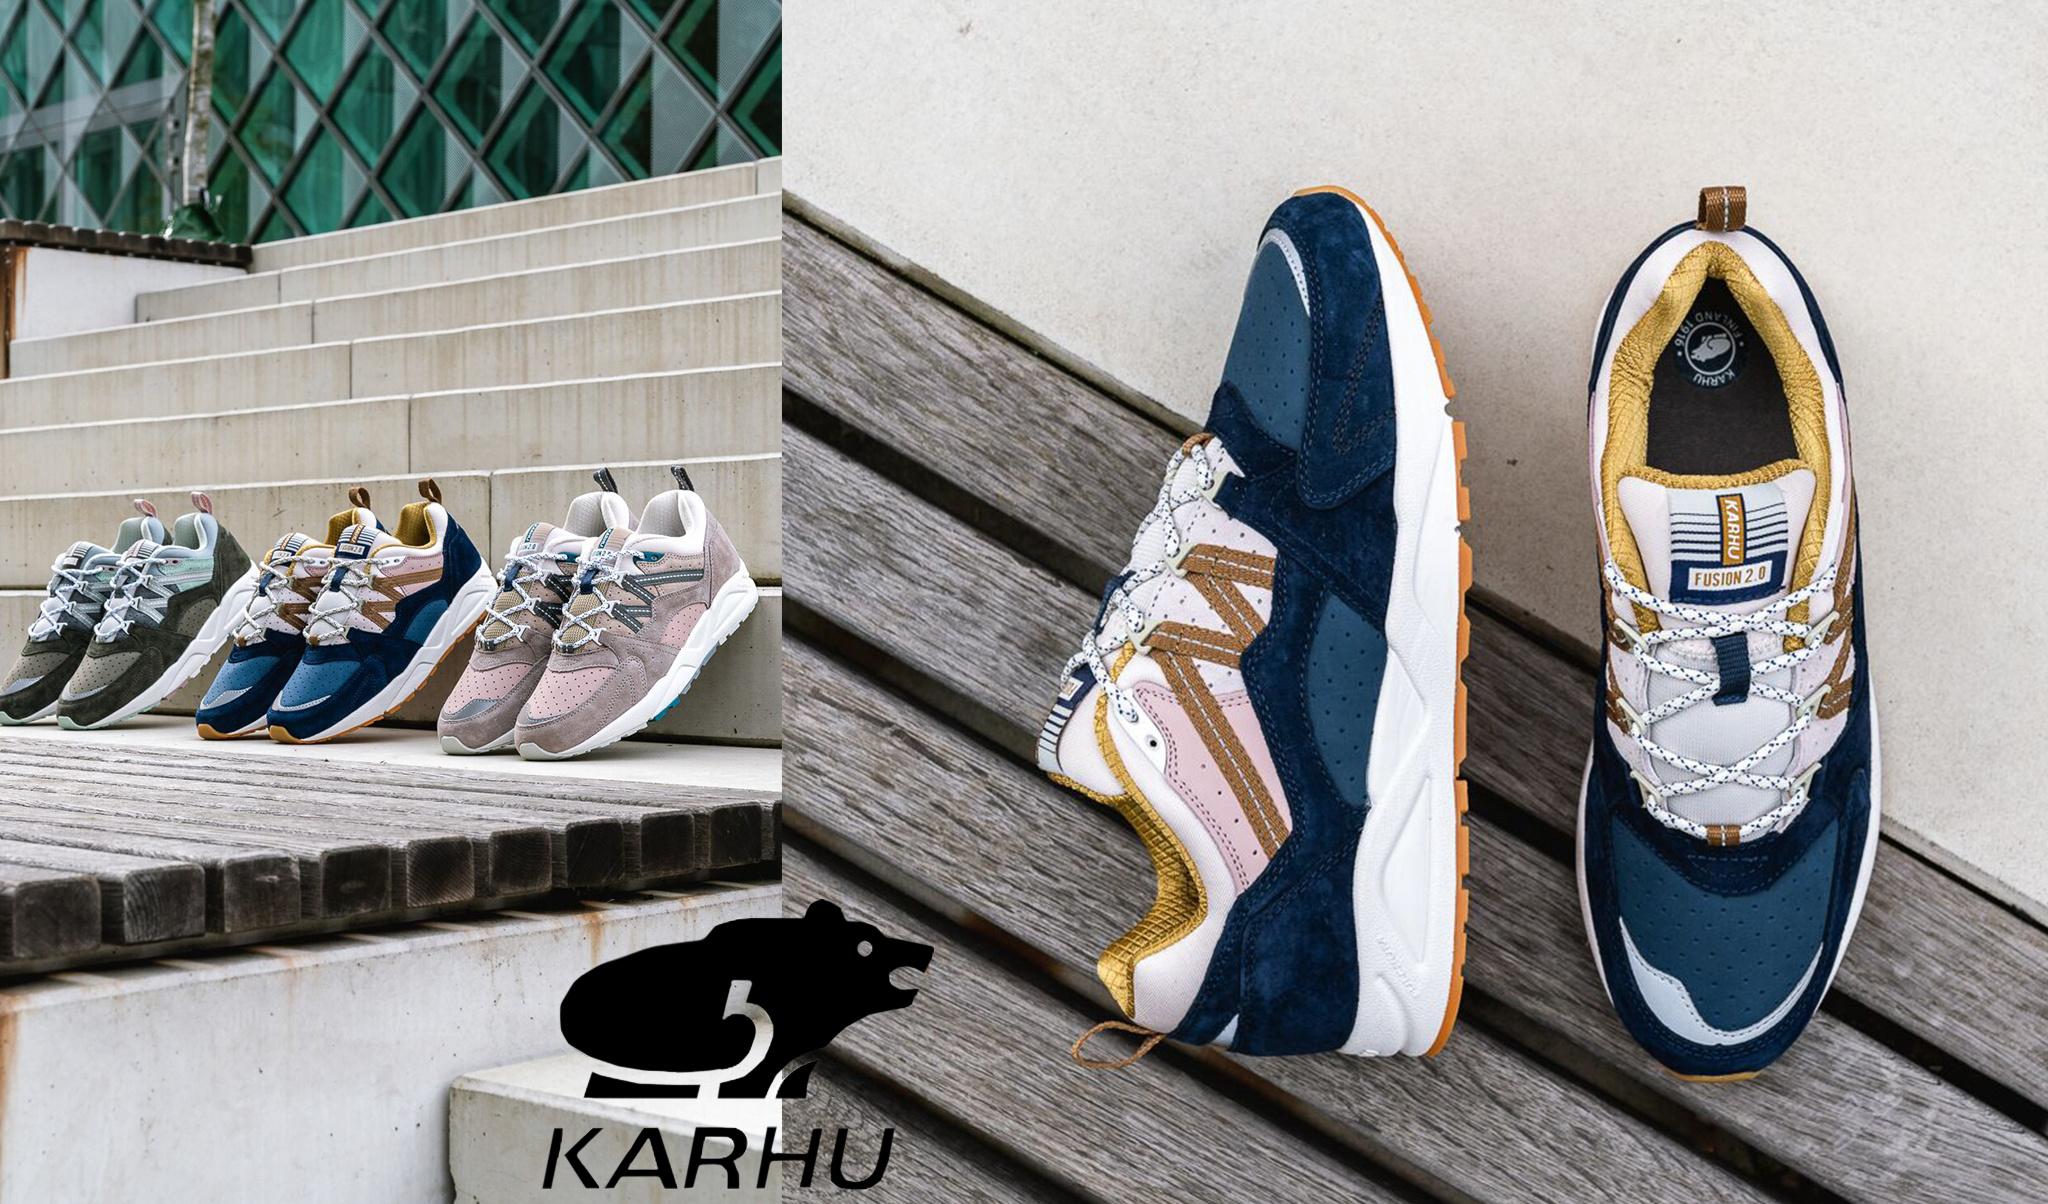 Release - Karhu Fusion Pack 2.0